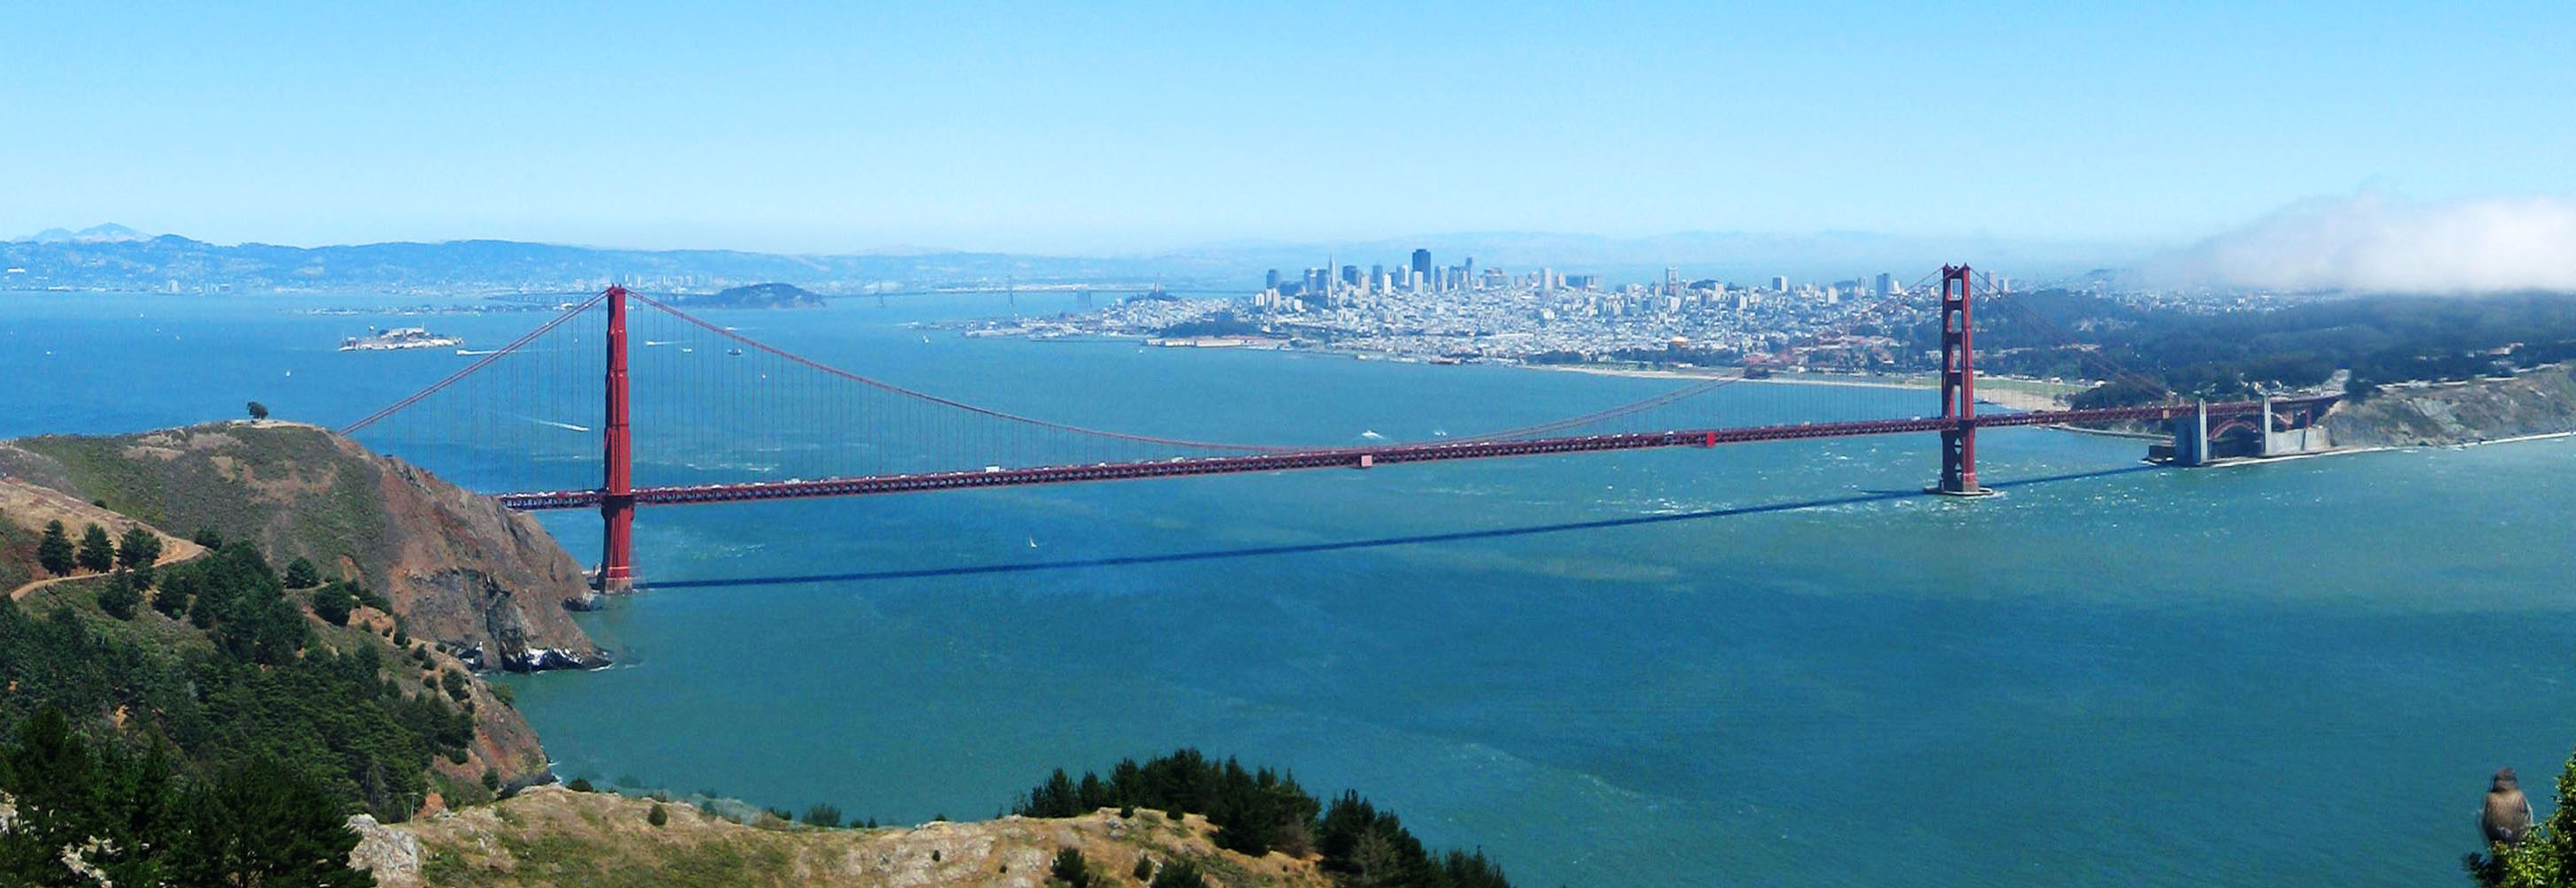 http://upload.wikimedia.org/wikipedia/commons/2/22/Golden_Gate_Panorama.jpg